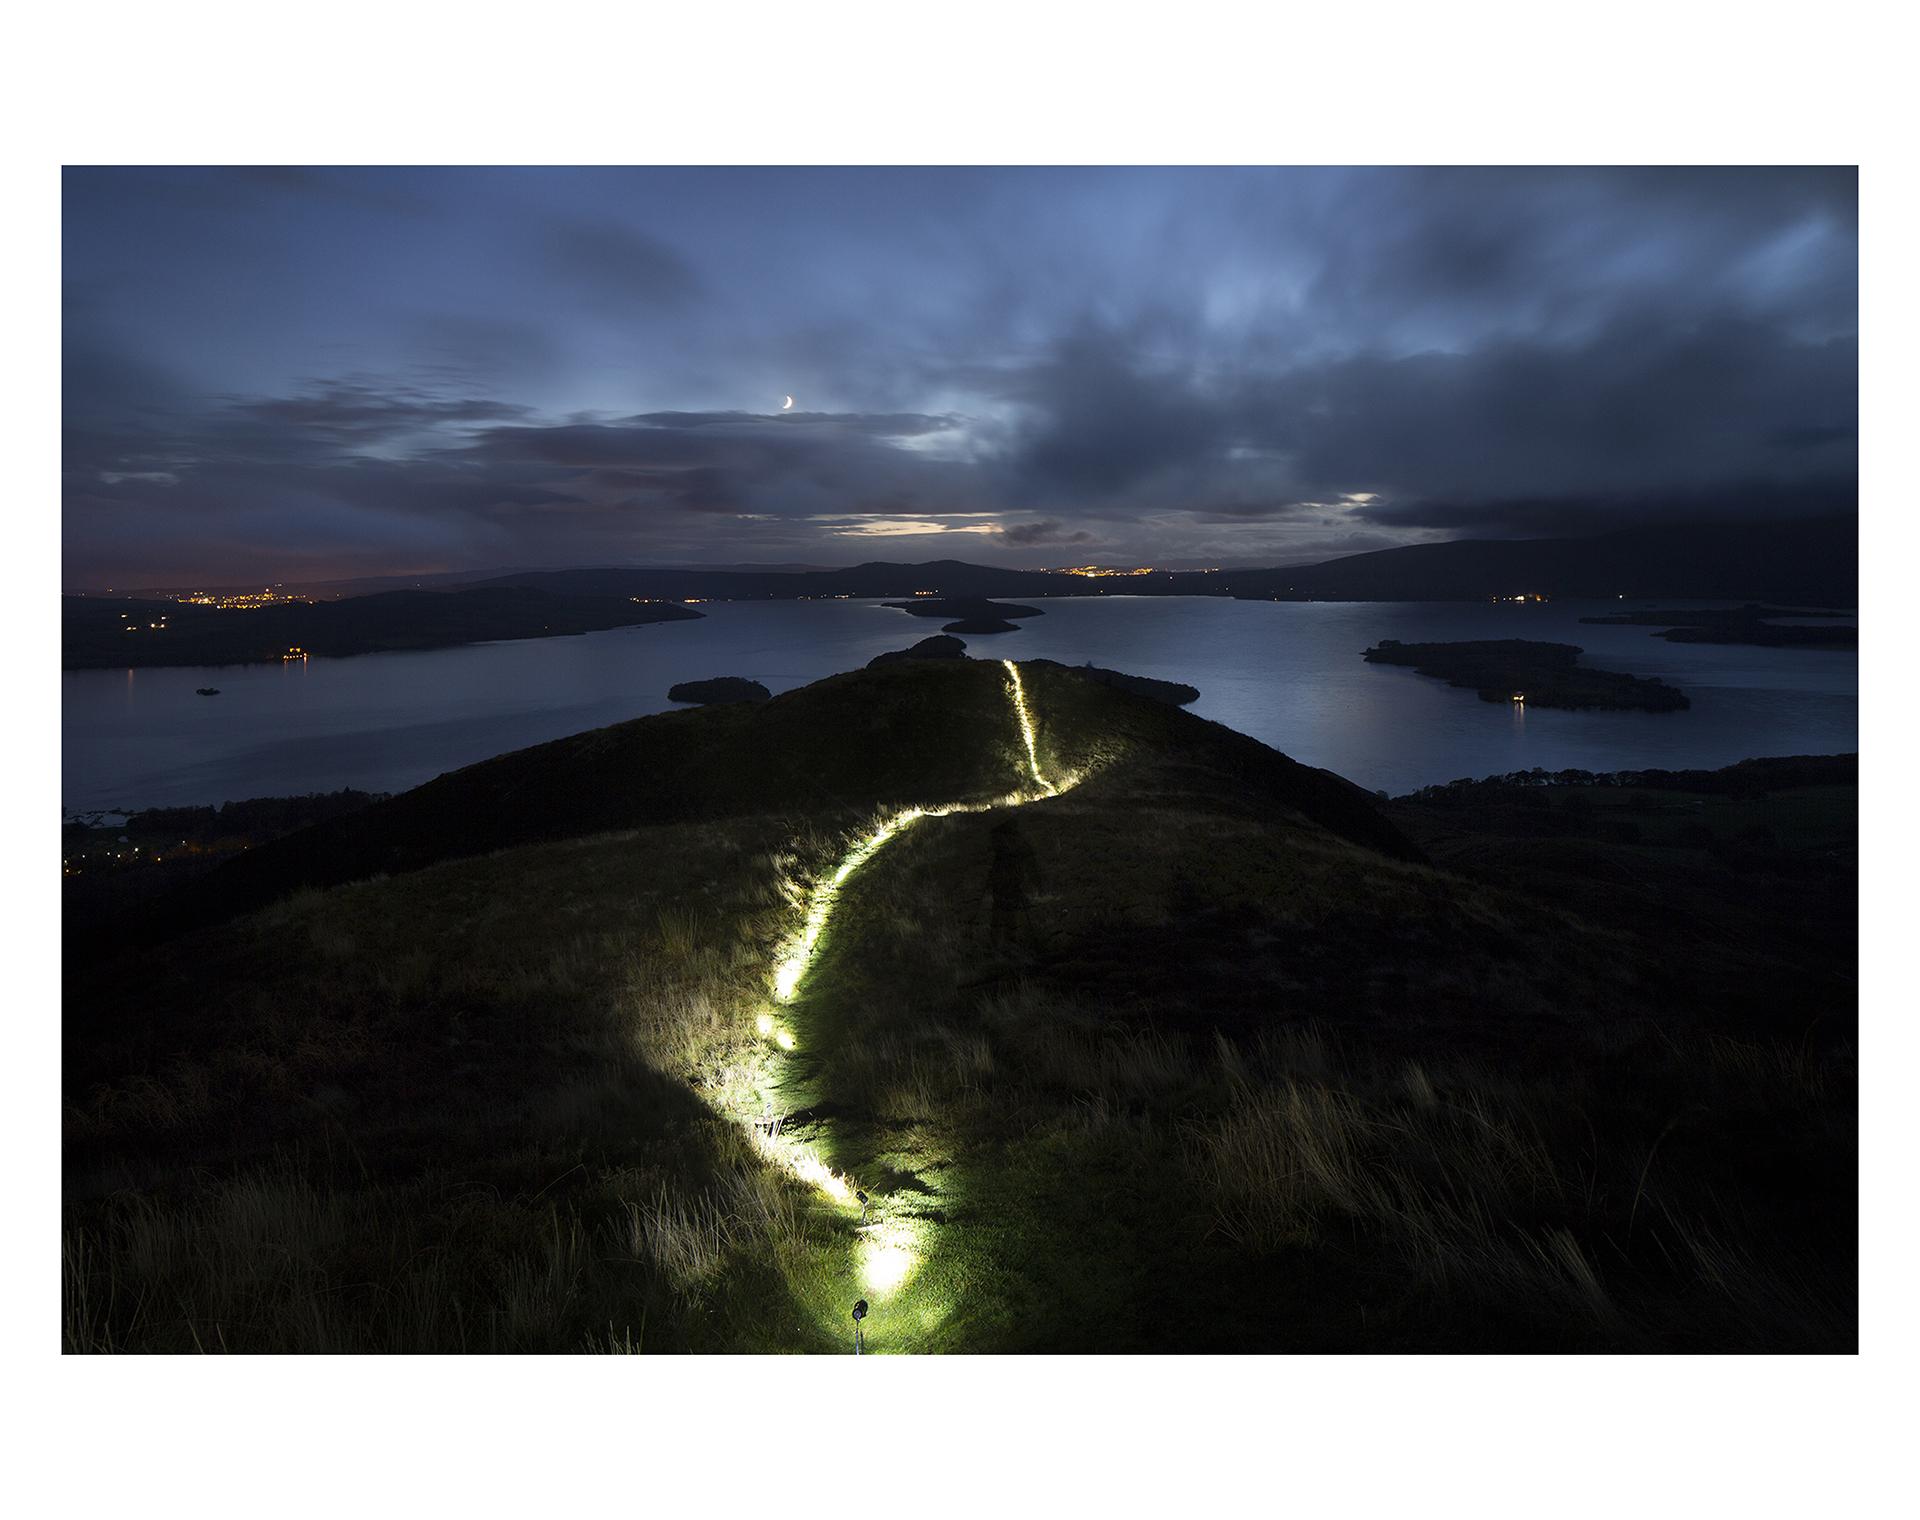 Image of Island Drift II (6/11/2013) by NVA, James Johnson & Alan McAteer